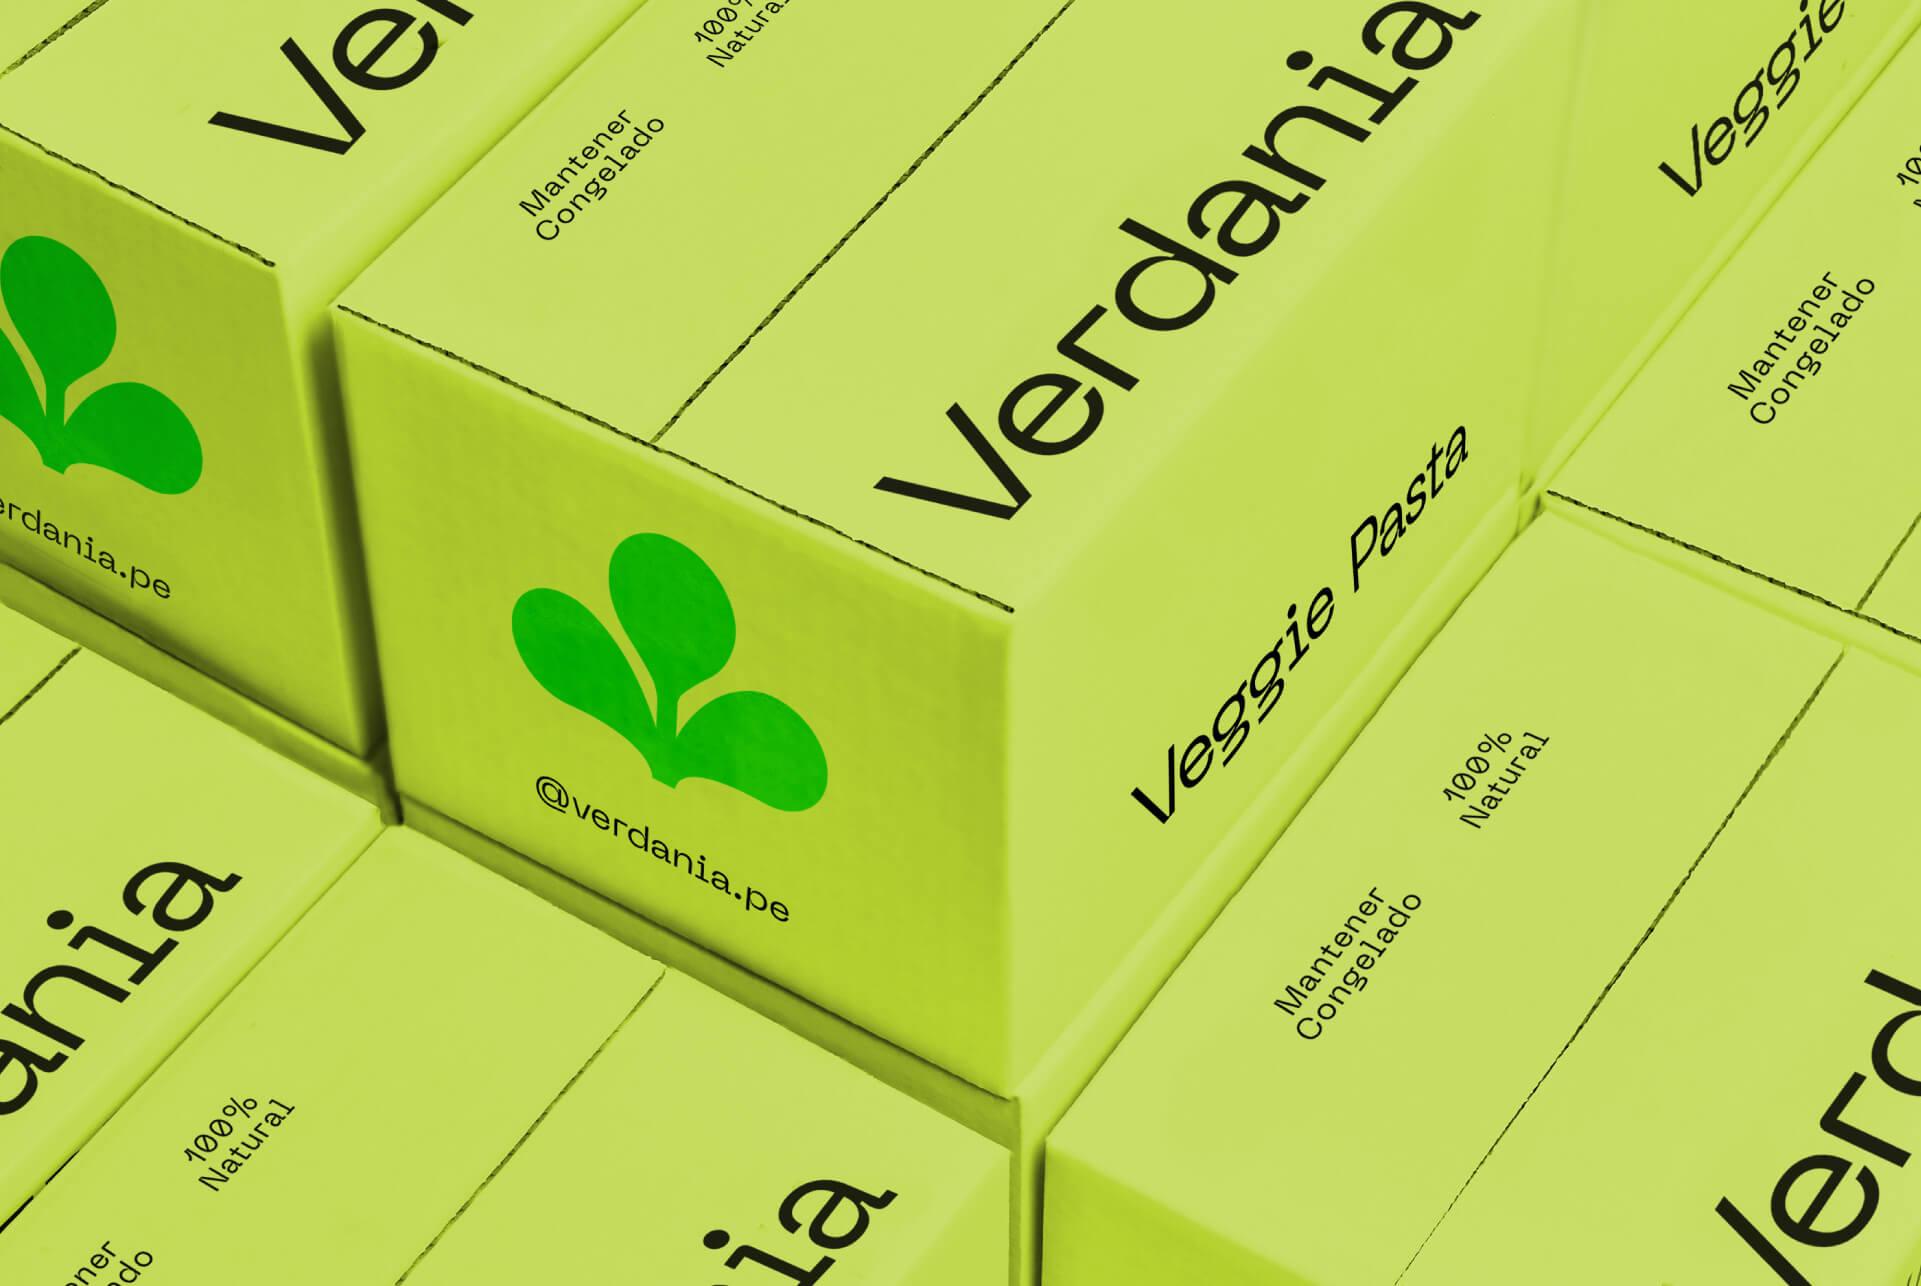 Verdania Fun Veggies Spagetthi Brand and Packaging Design by Tais Kahatt